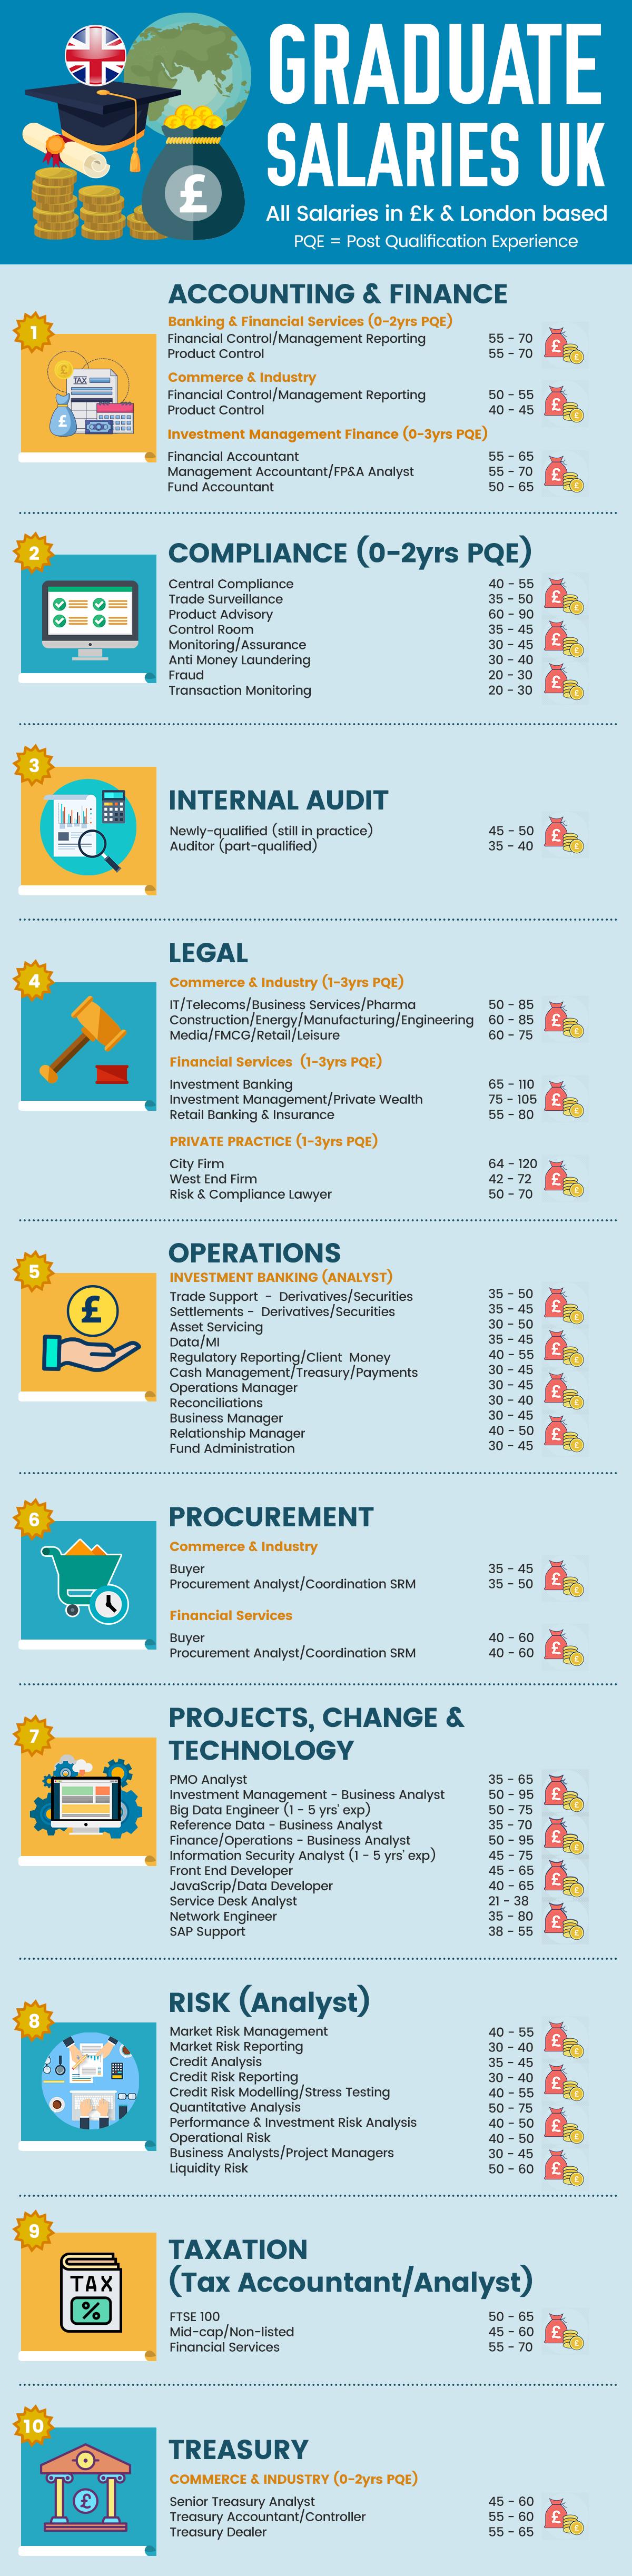 Graduate Salaries UK Infographic